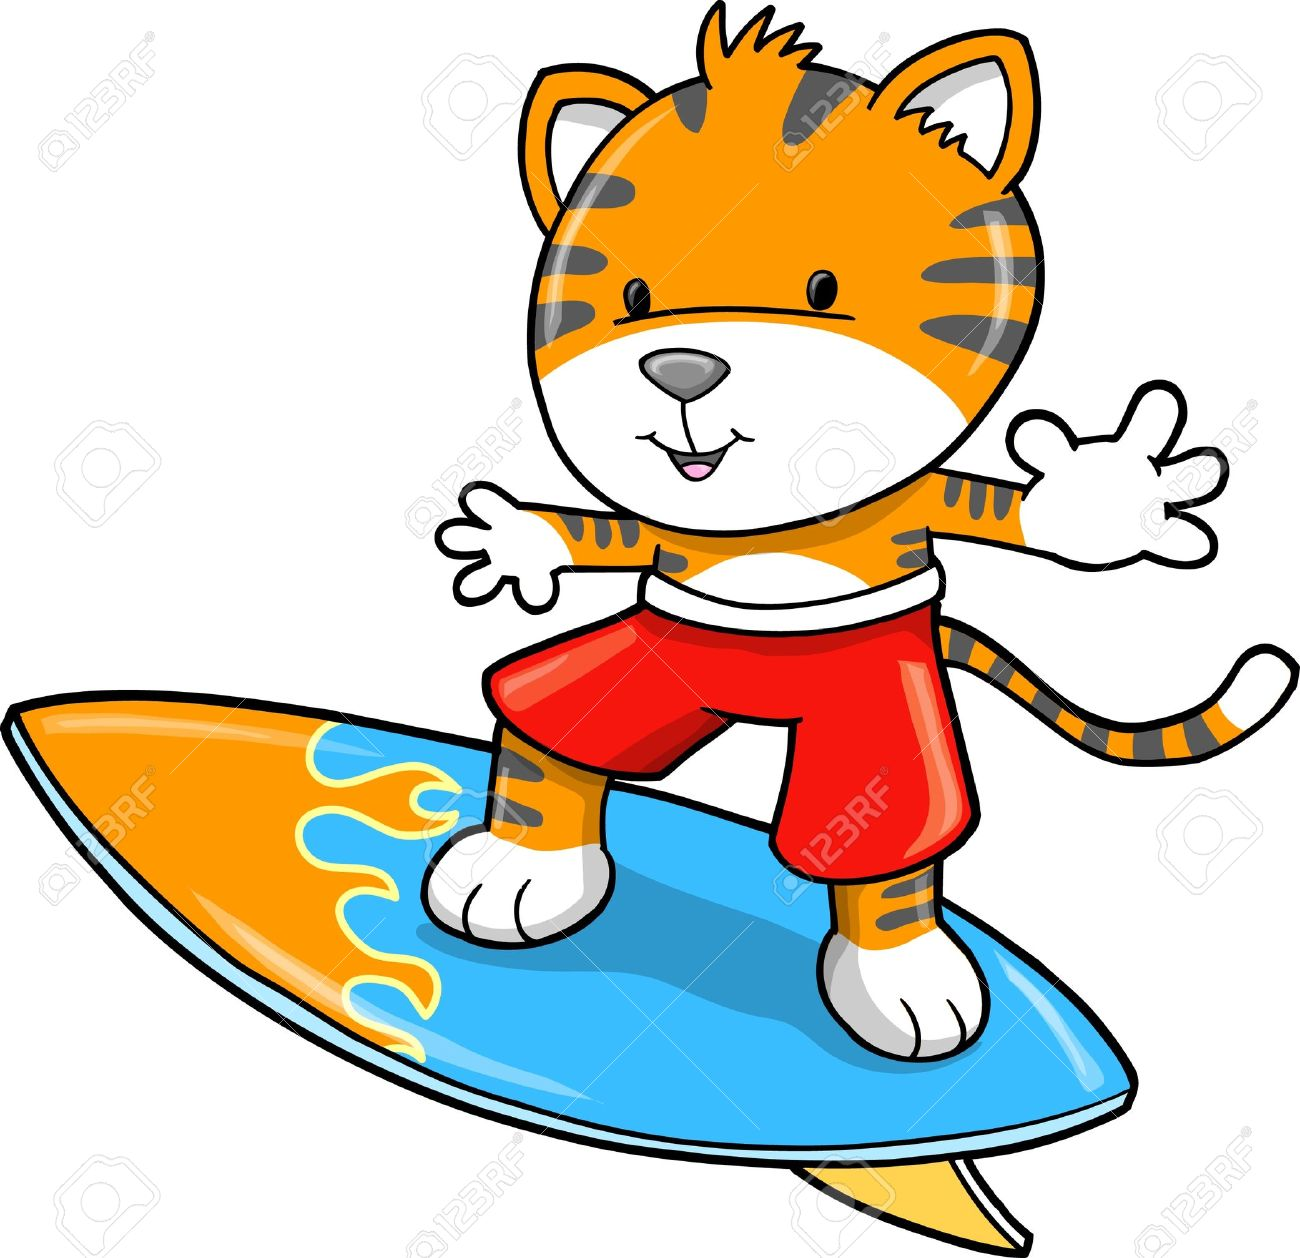 Cute Safari Surfing Tiger Illustration - 10031026